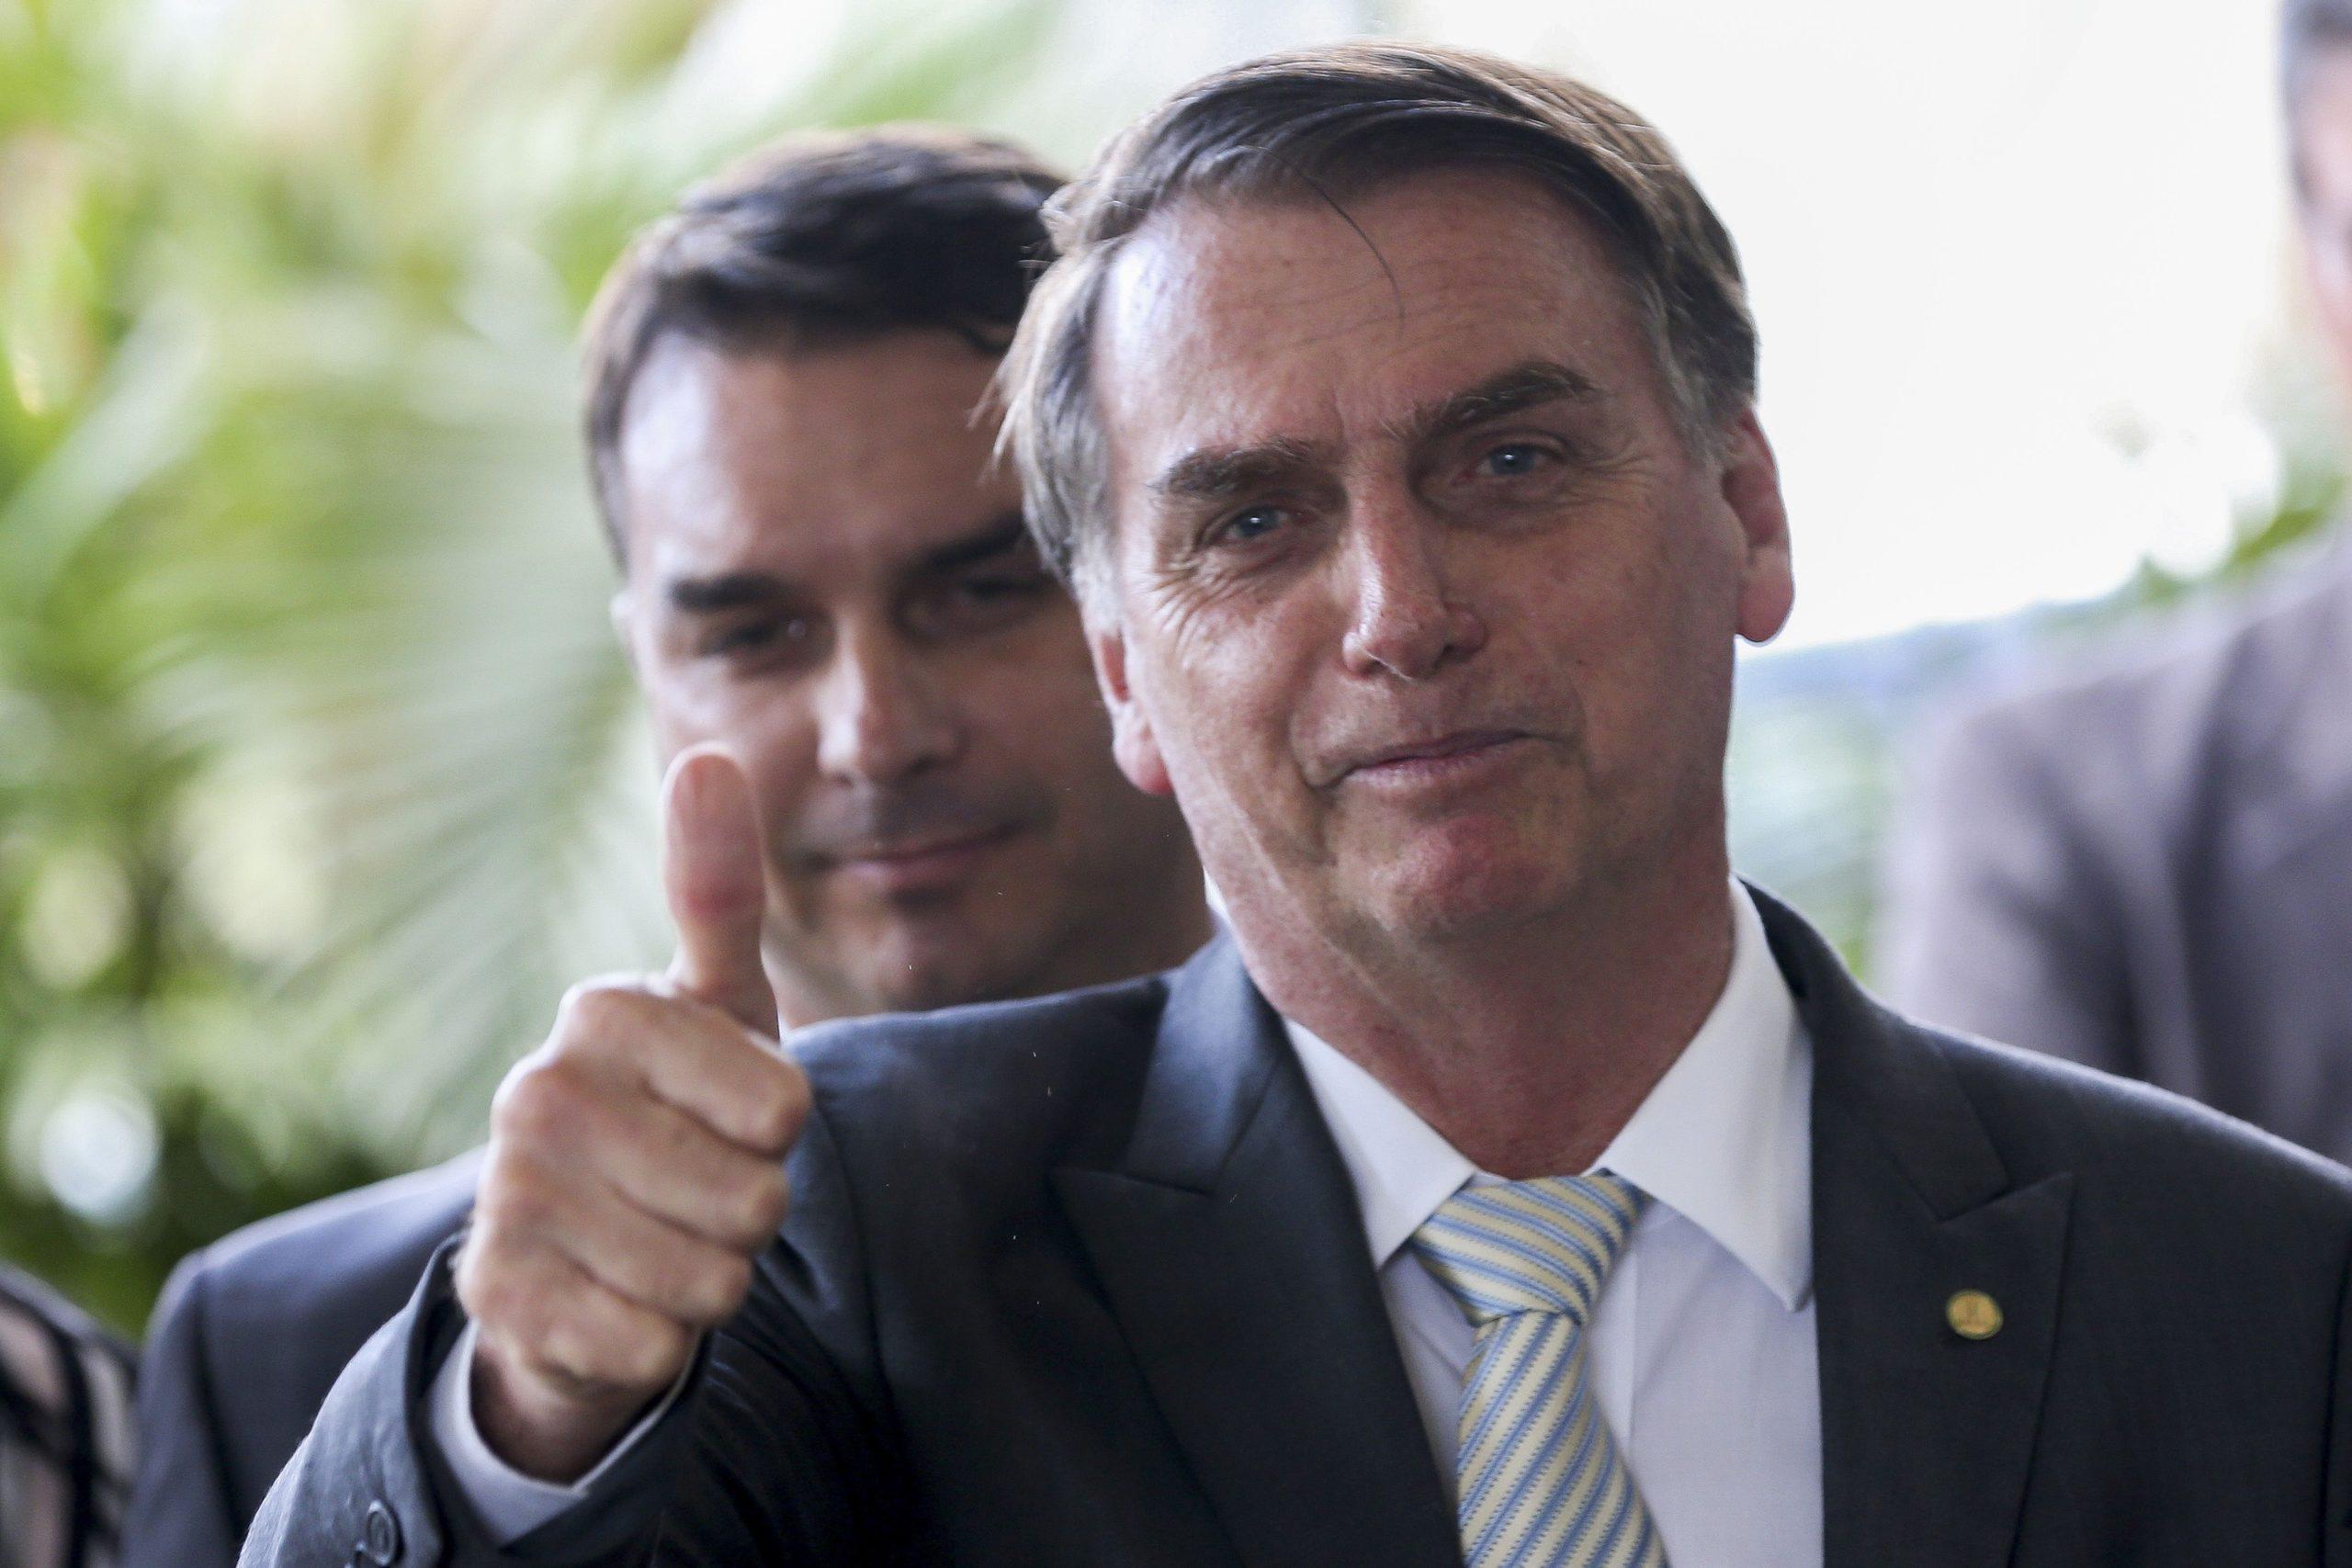 27.11.2018 - Brasília/DF - Jair Bolsonaro e Flávio Bolsonaro durante entrevista à imprensa, no CCBB. Foto: Wilson Dias/Agência Brasil